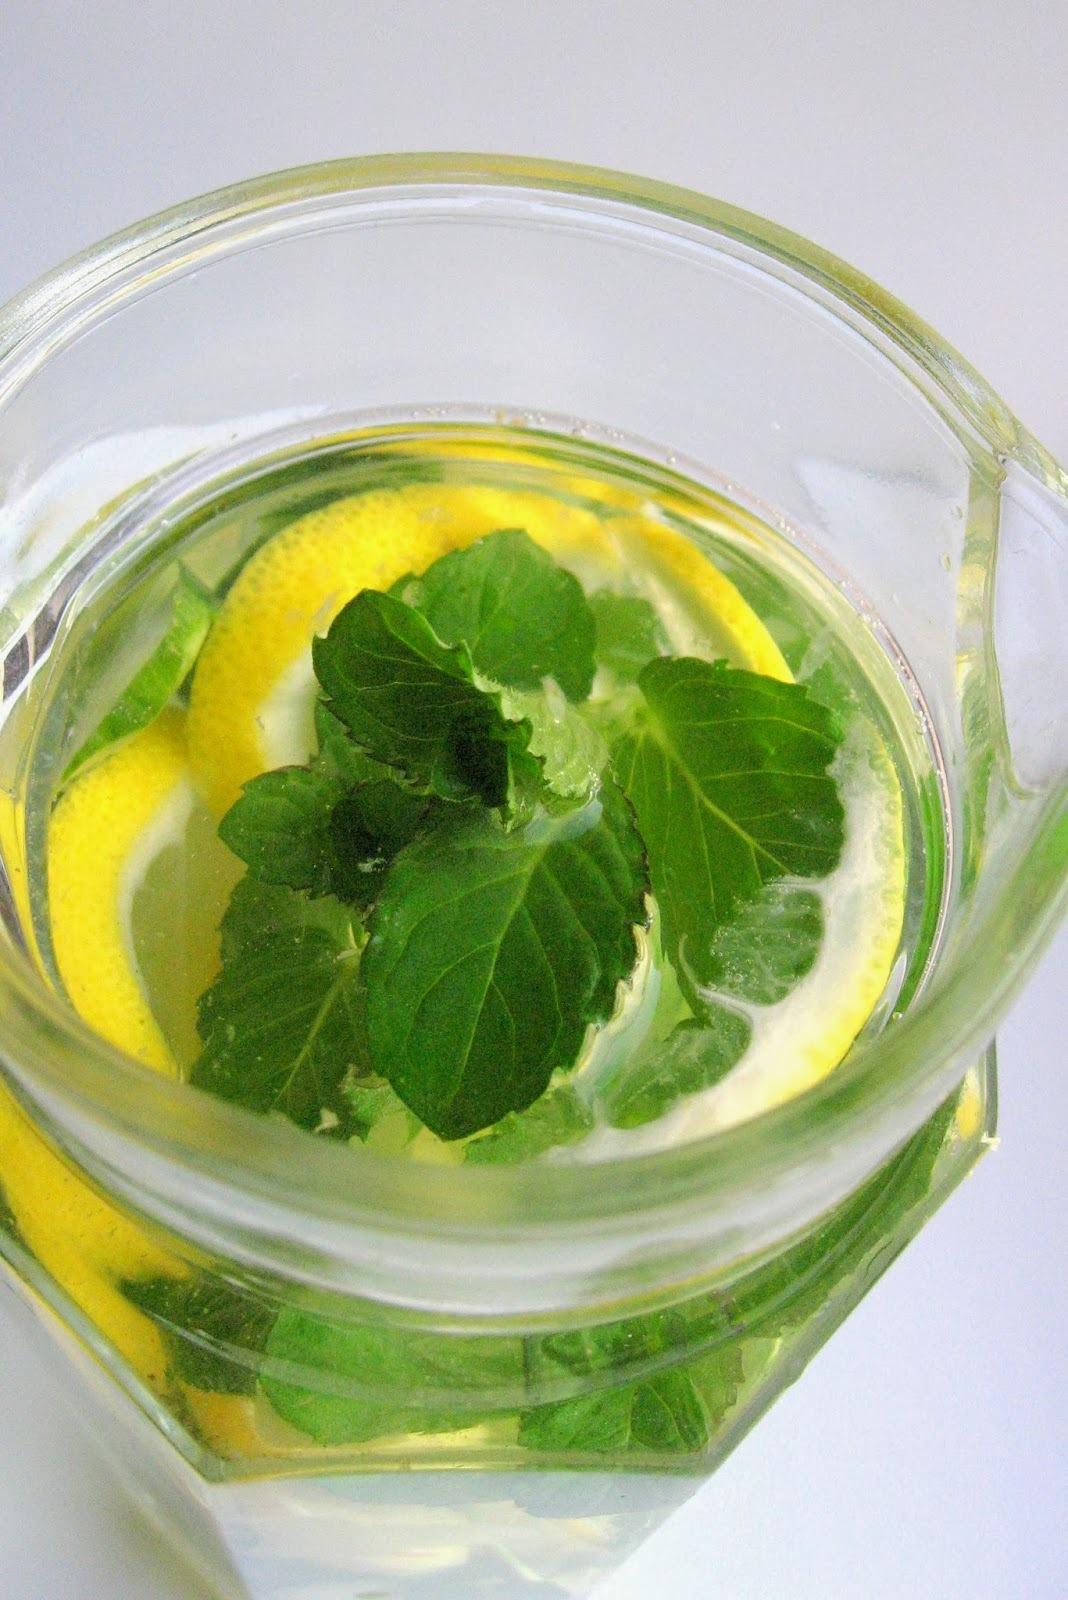 citromfű limonádé